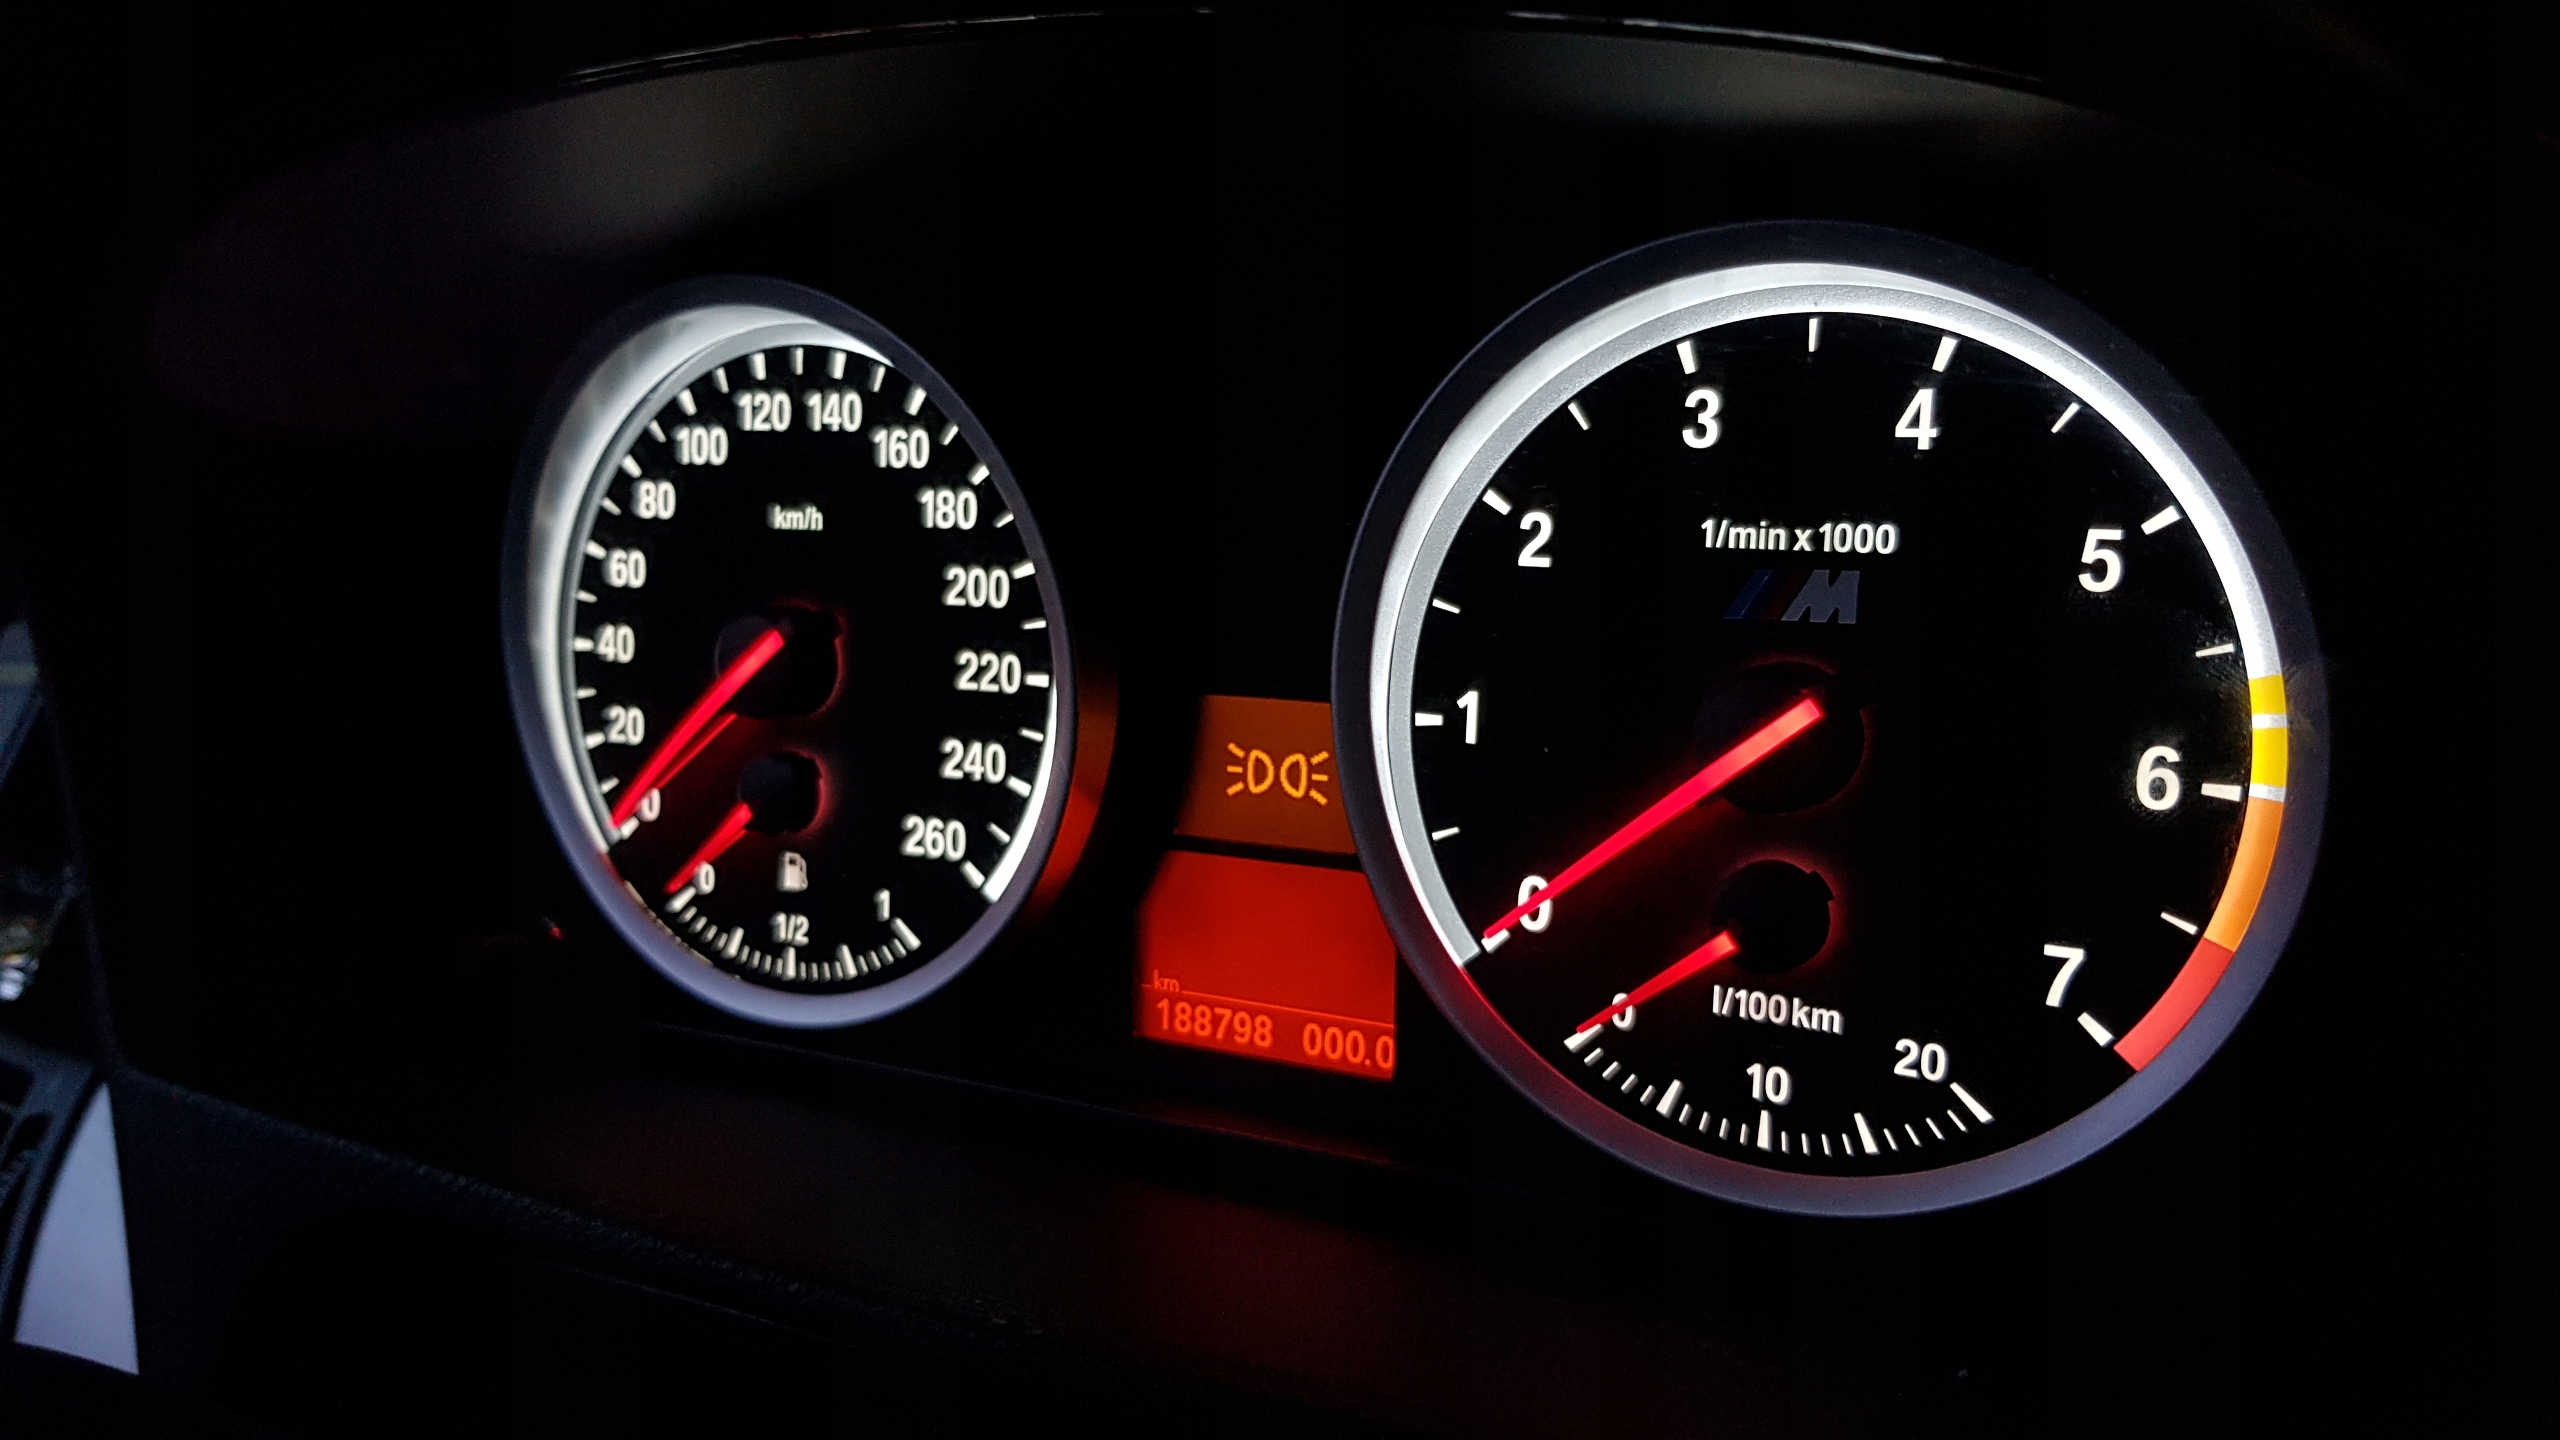 M5 Style Przerobka Zegarow Dla Bmw E60 E61 5er Krakow Allegro Pl